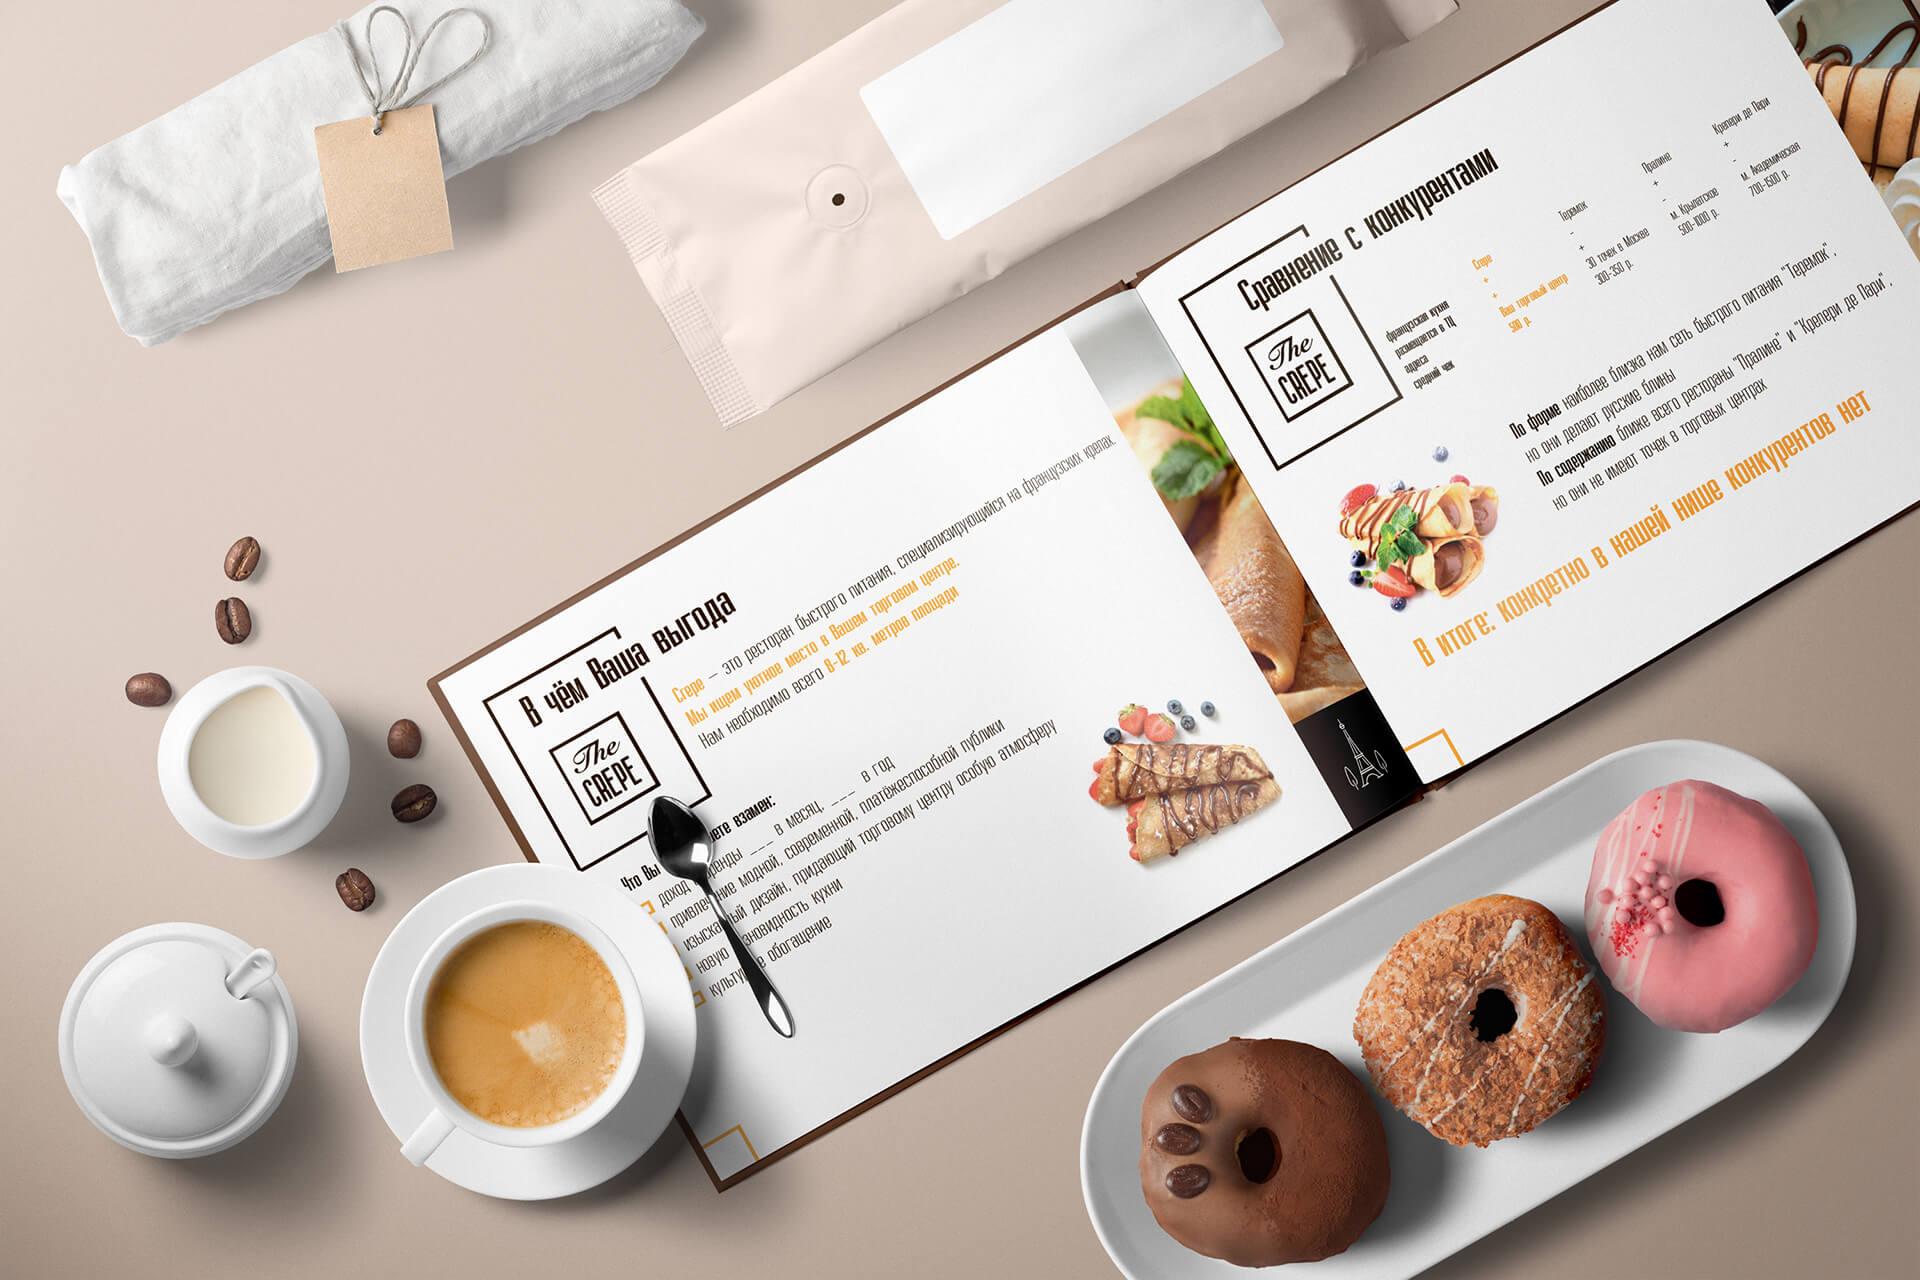 Презентация для аренды в торговом центре (ТЦ), образец в pdf